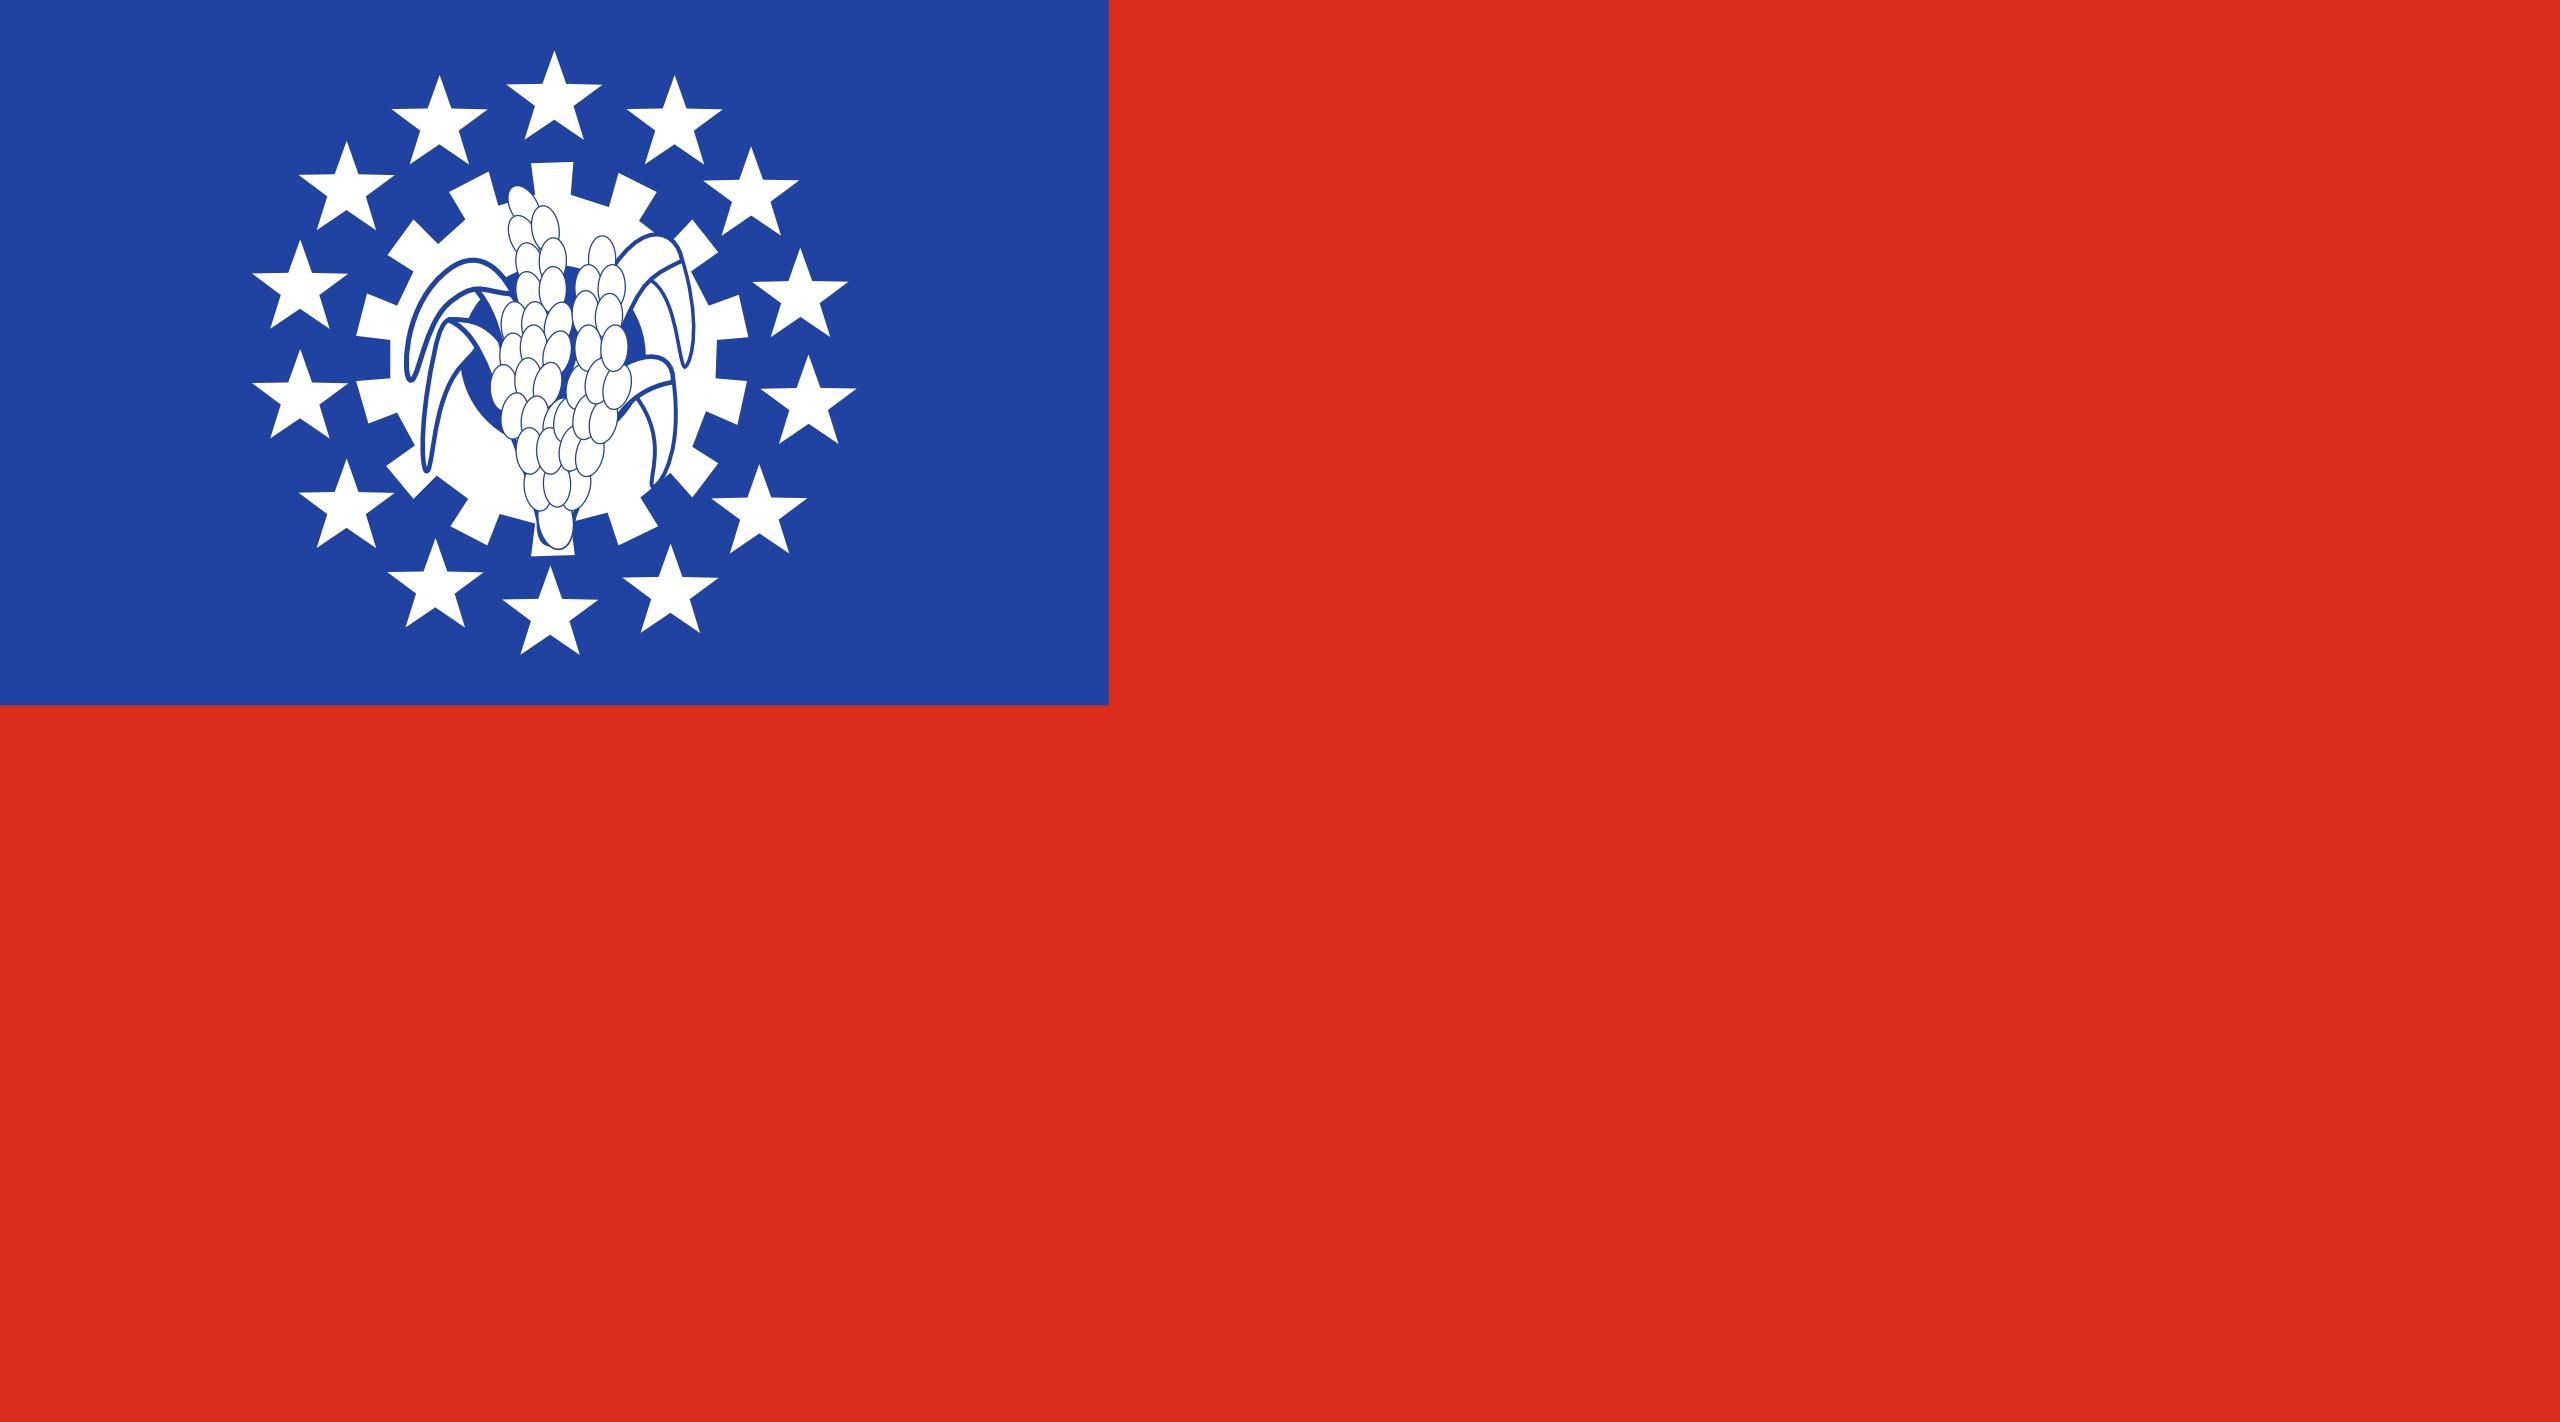 Birmania, paese, emblema, logo, simbolo - Sfondi HD - Professor-falken.com